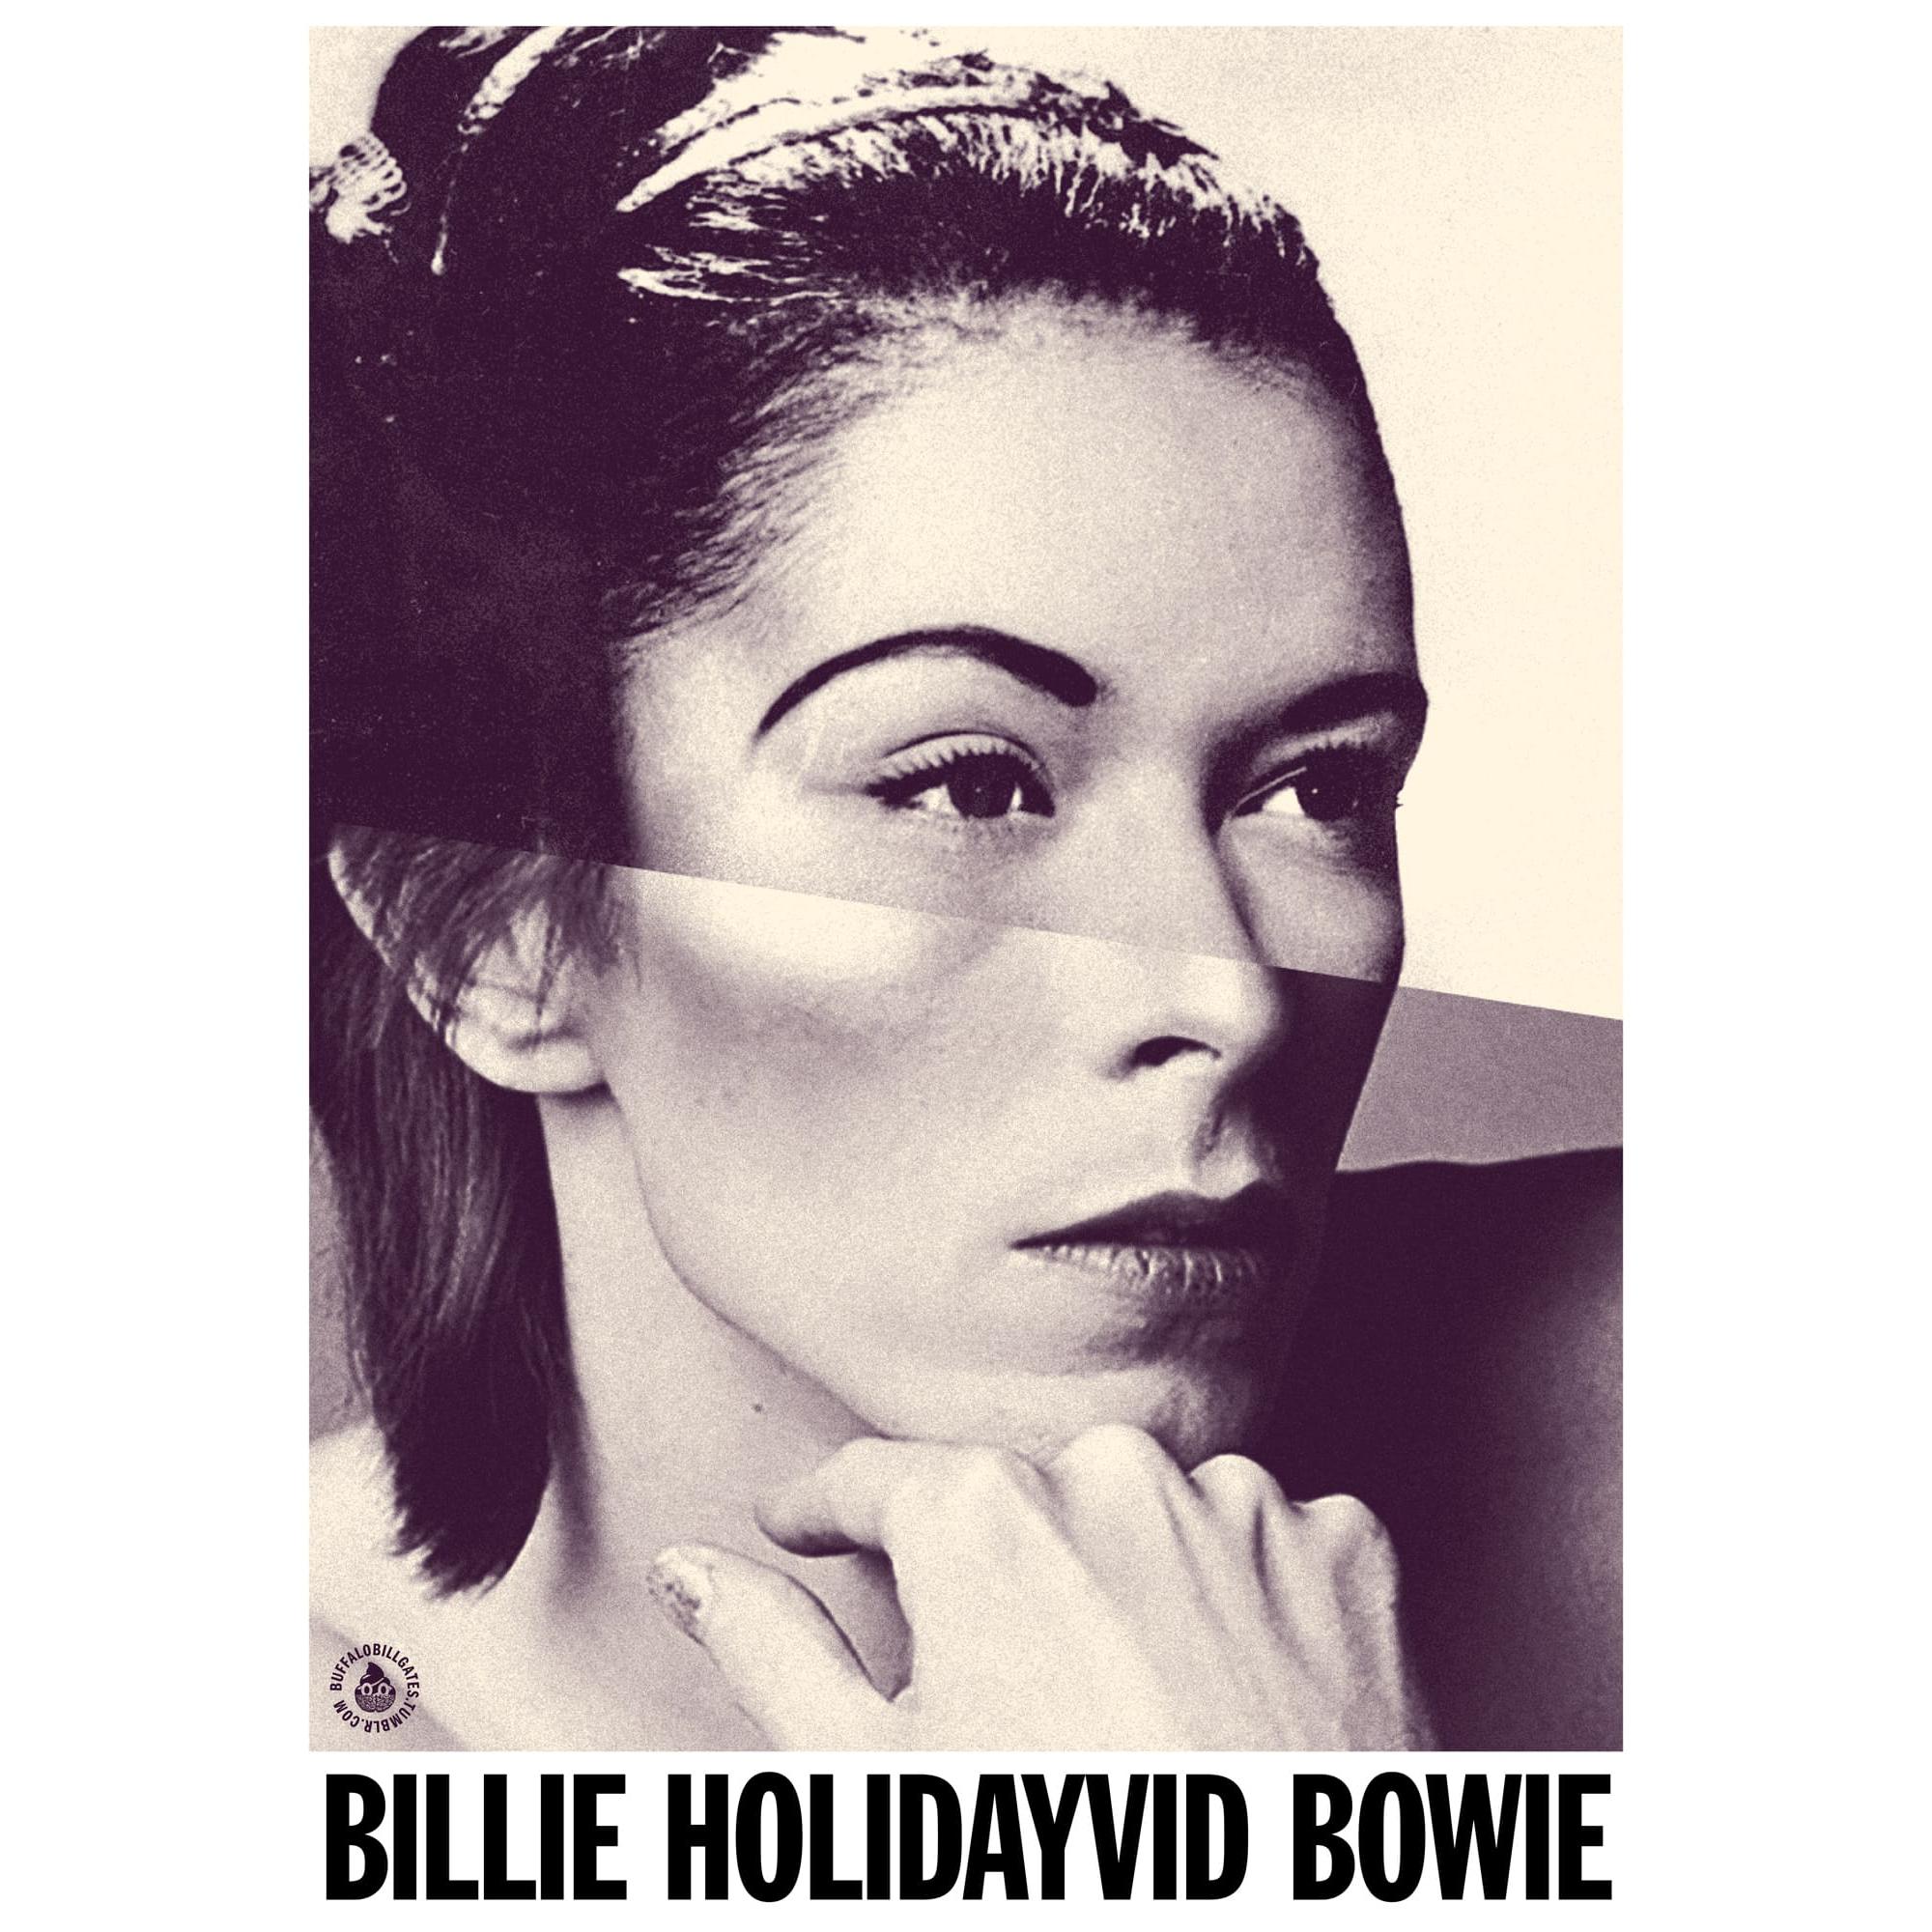 STUDIO KALLE MATTSSON 'BILLIE HOLIDAYVID BOWIE' Mashup Art Print